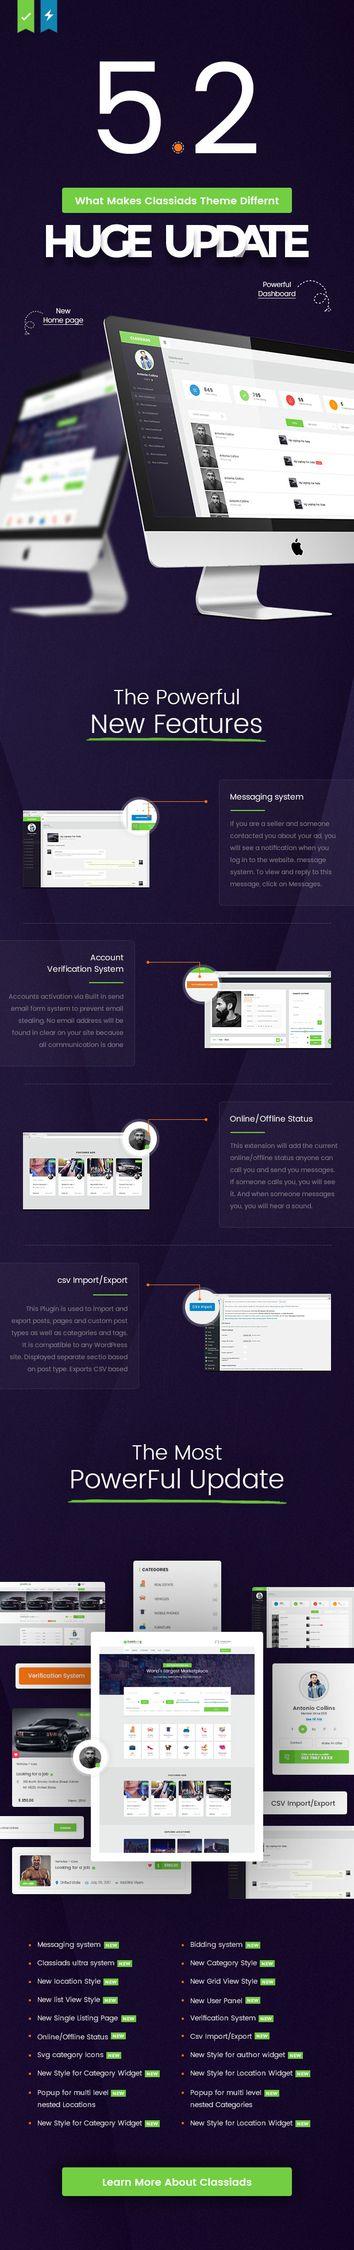 Prime Classified Ads Wordpress  - classiads_classified_wordpress_theme | ello